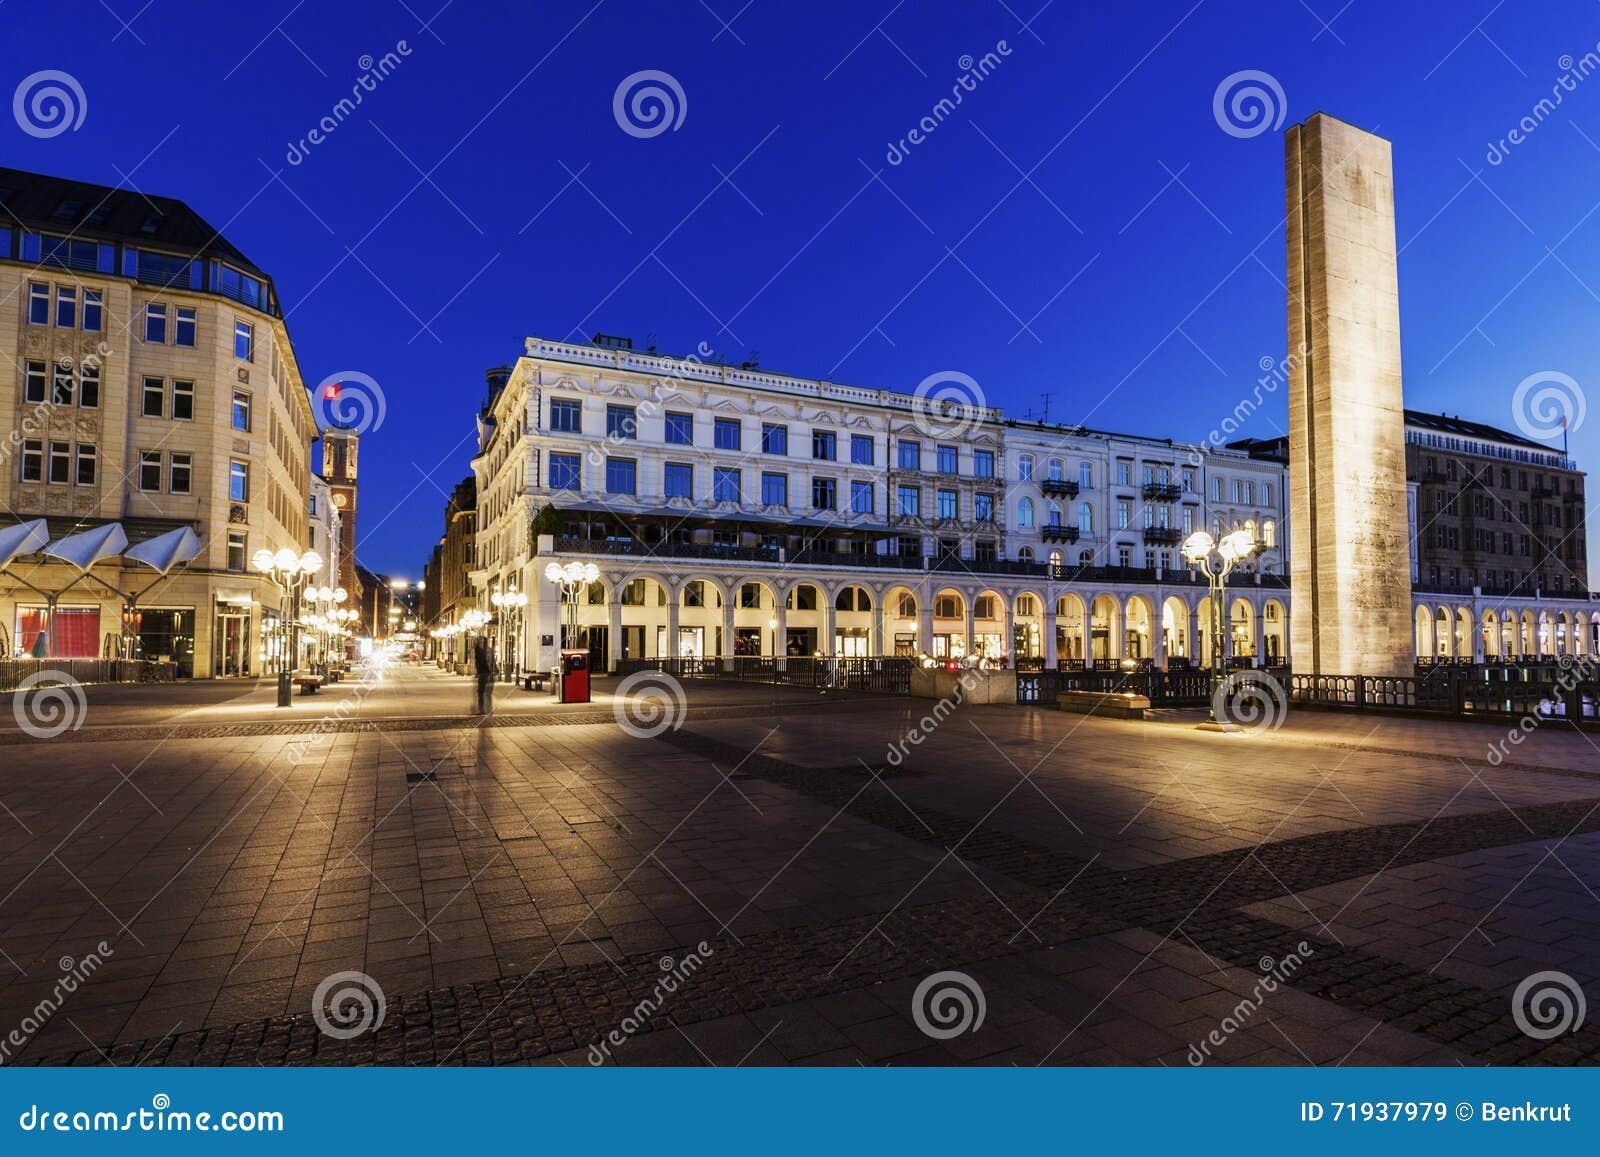 Rathausmarkt в Гамбурге